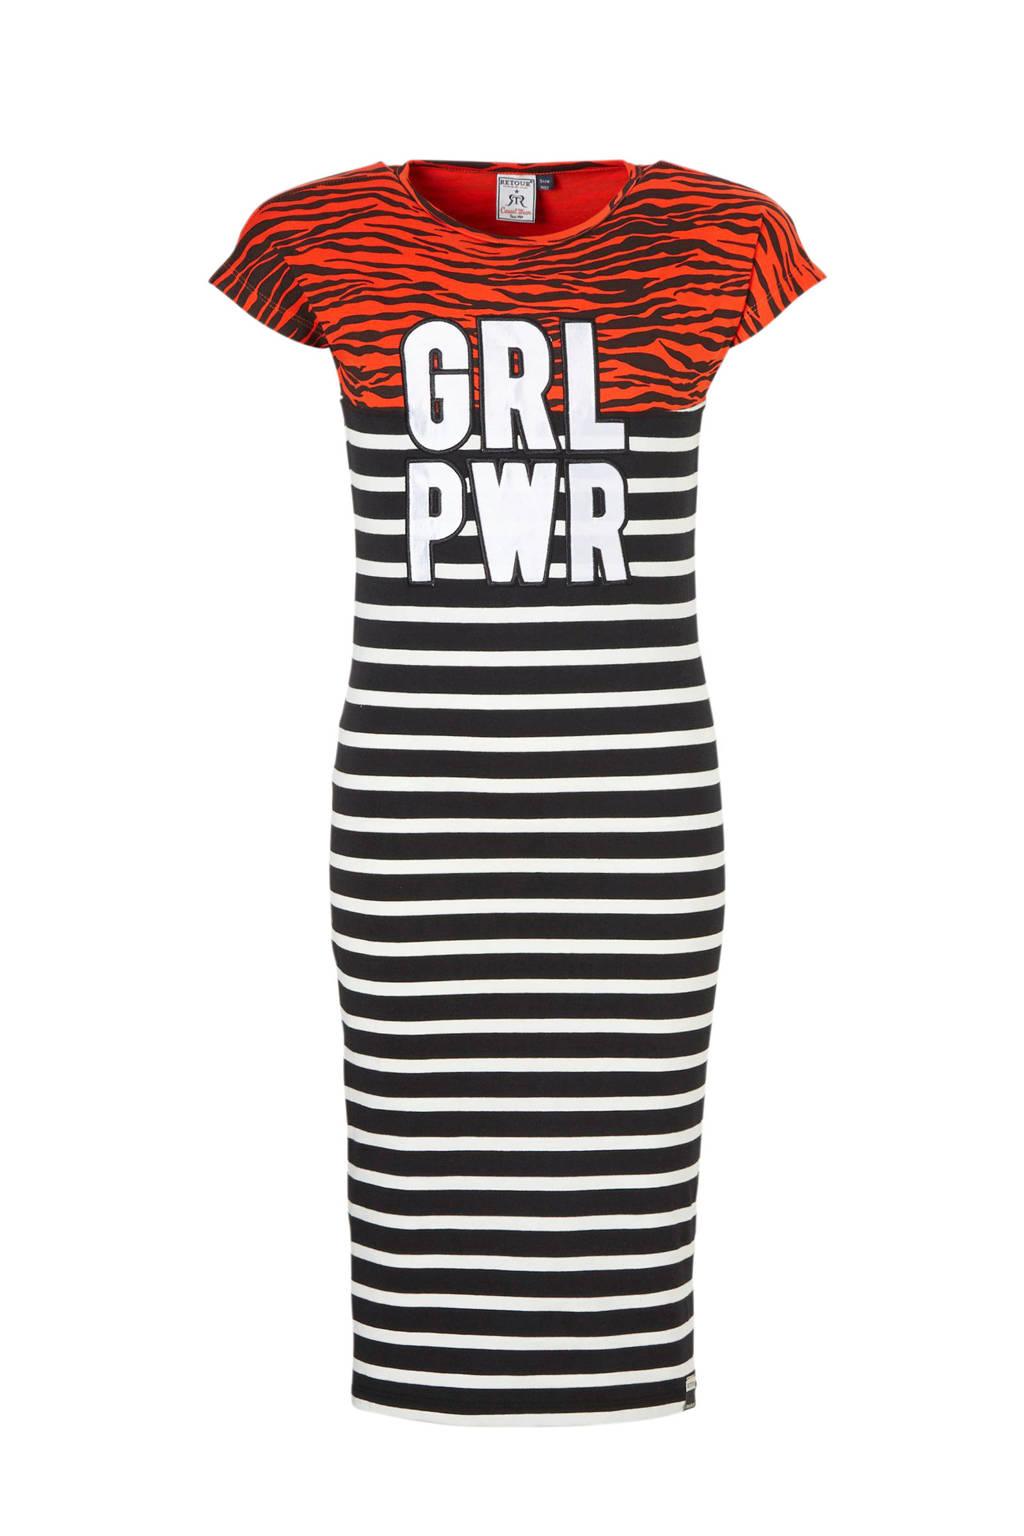 Retour Denim gestreepte jurk Ginger met tekst rood, Rood/zwart/wit